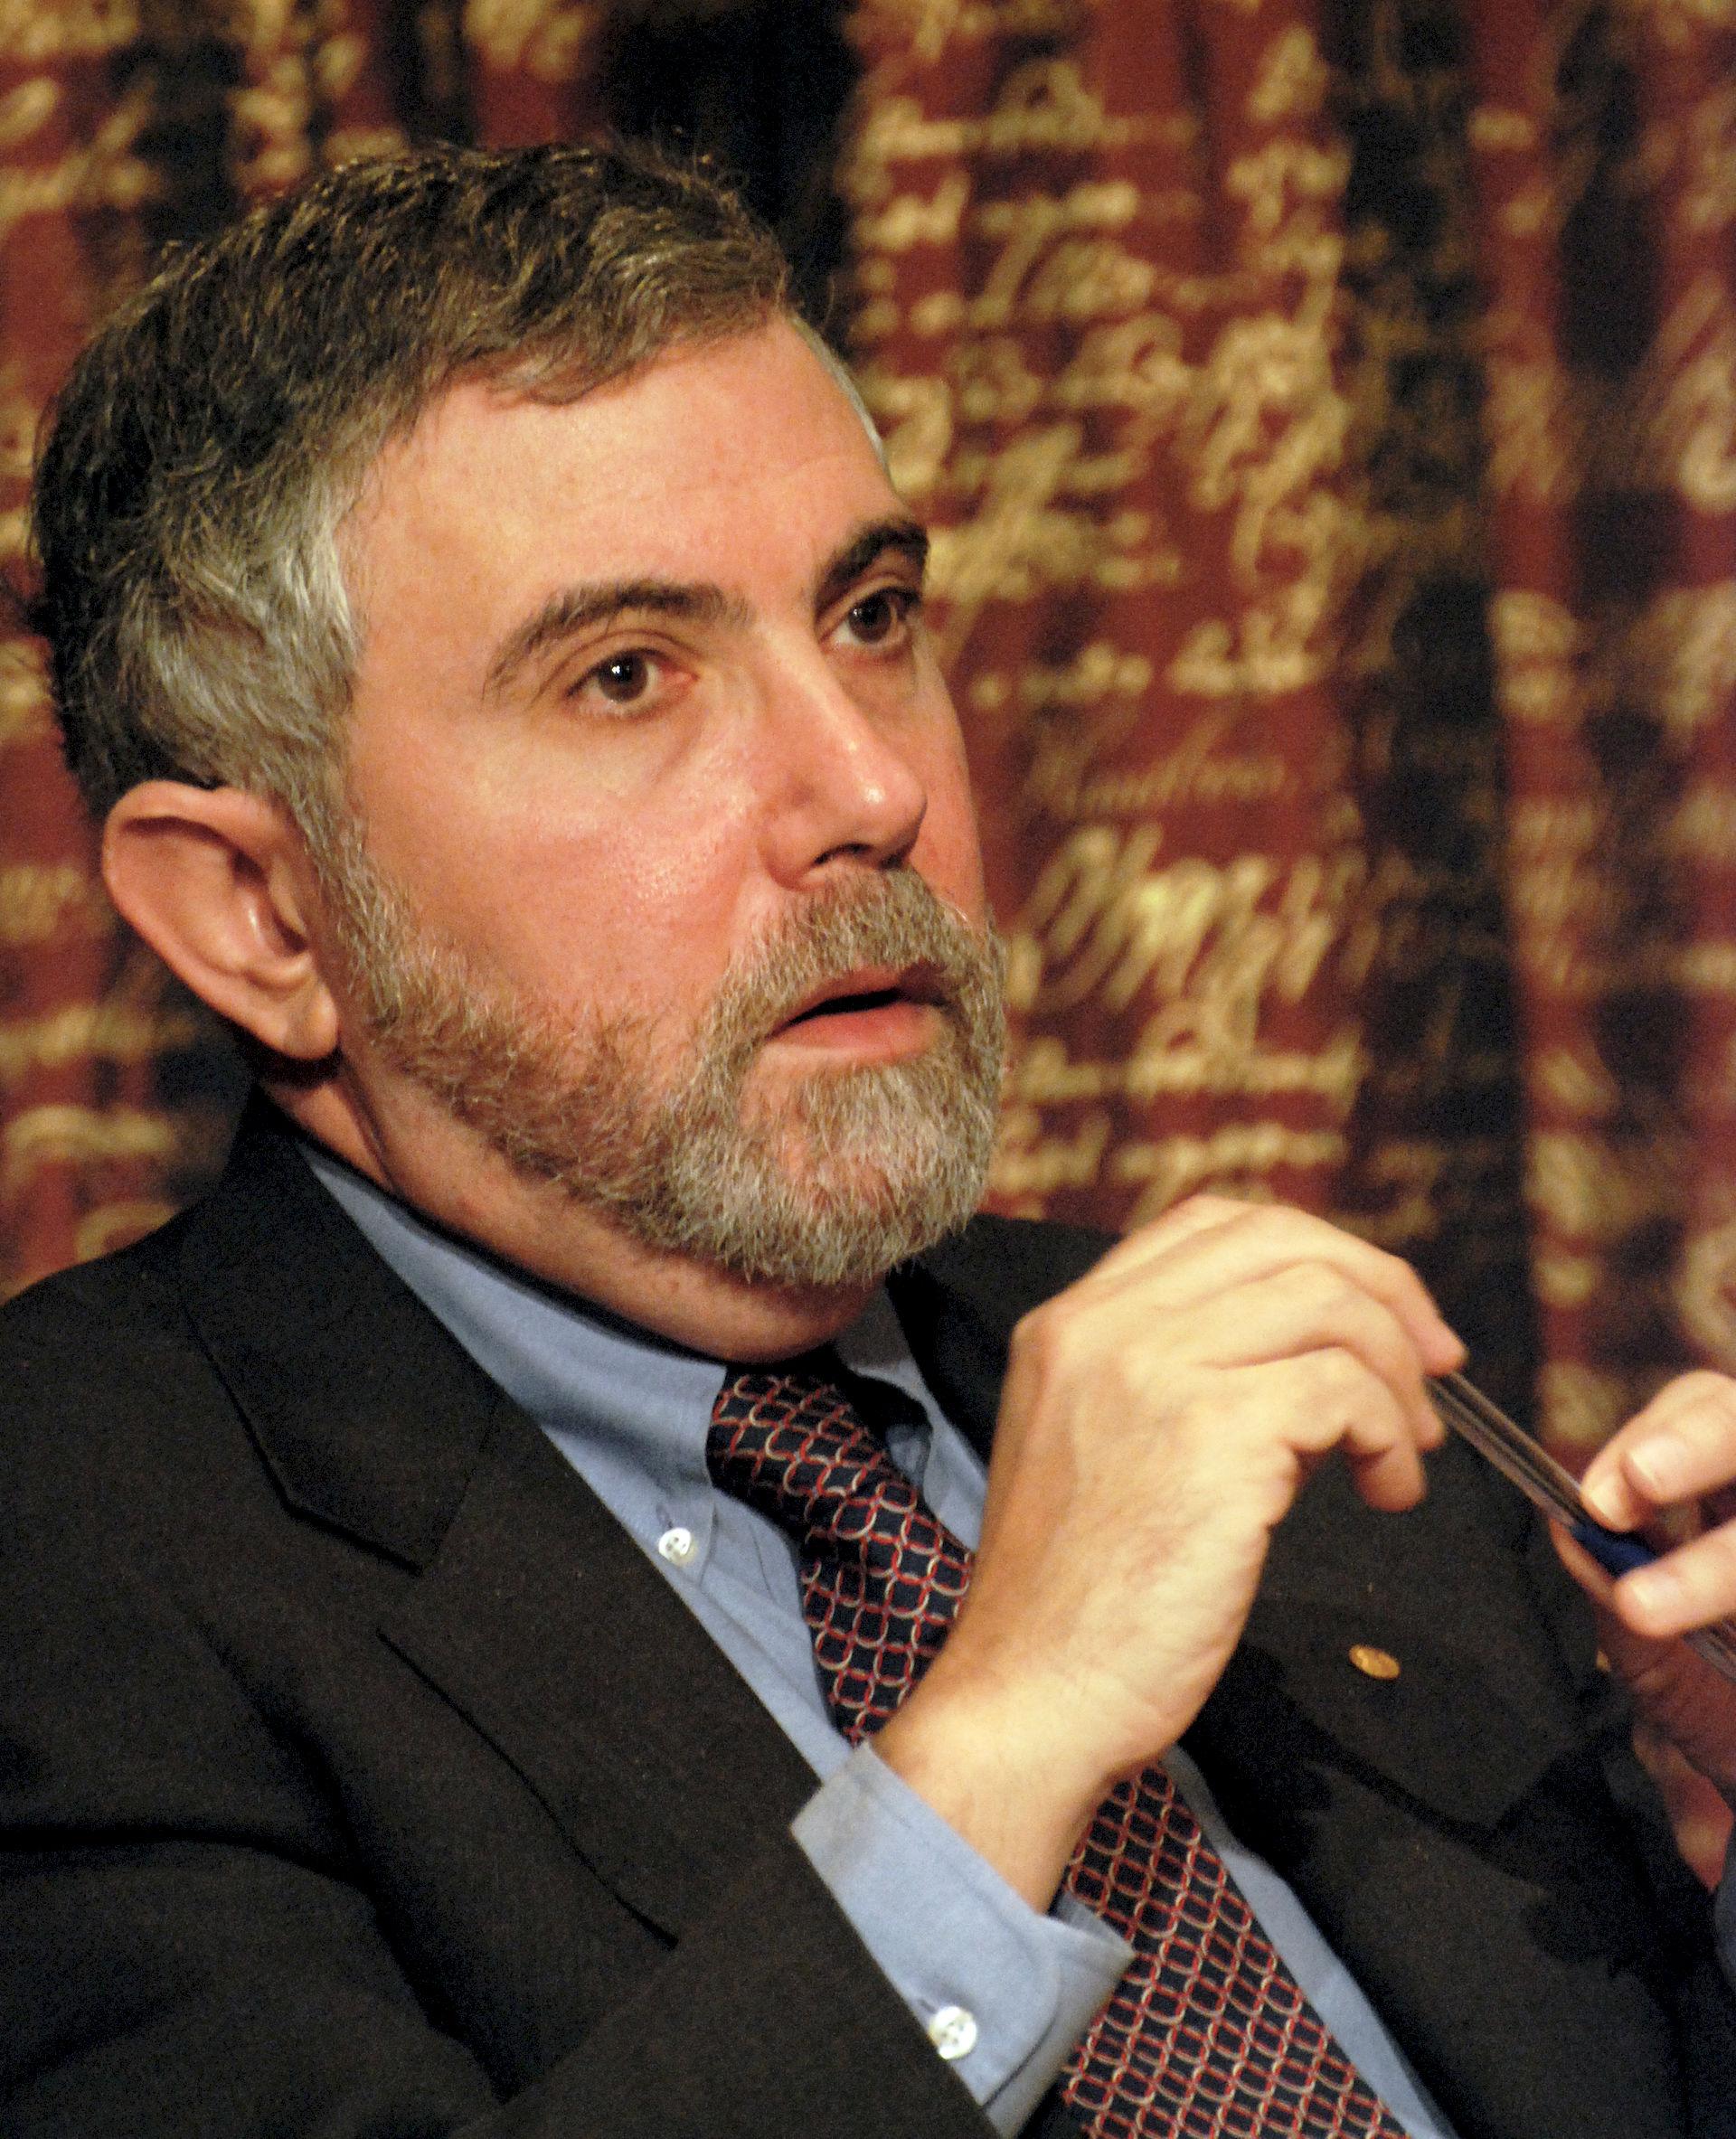 Photo of Paul Krugman: American economist